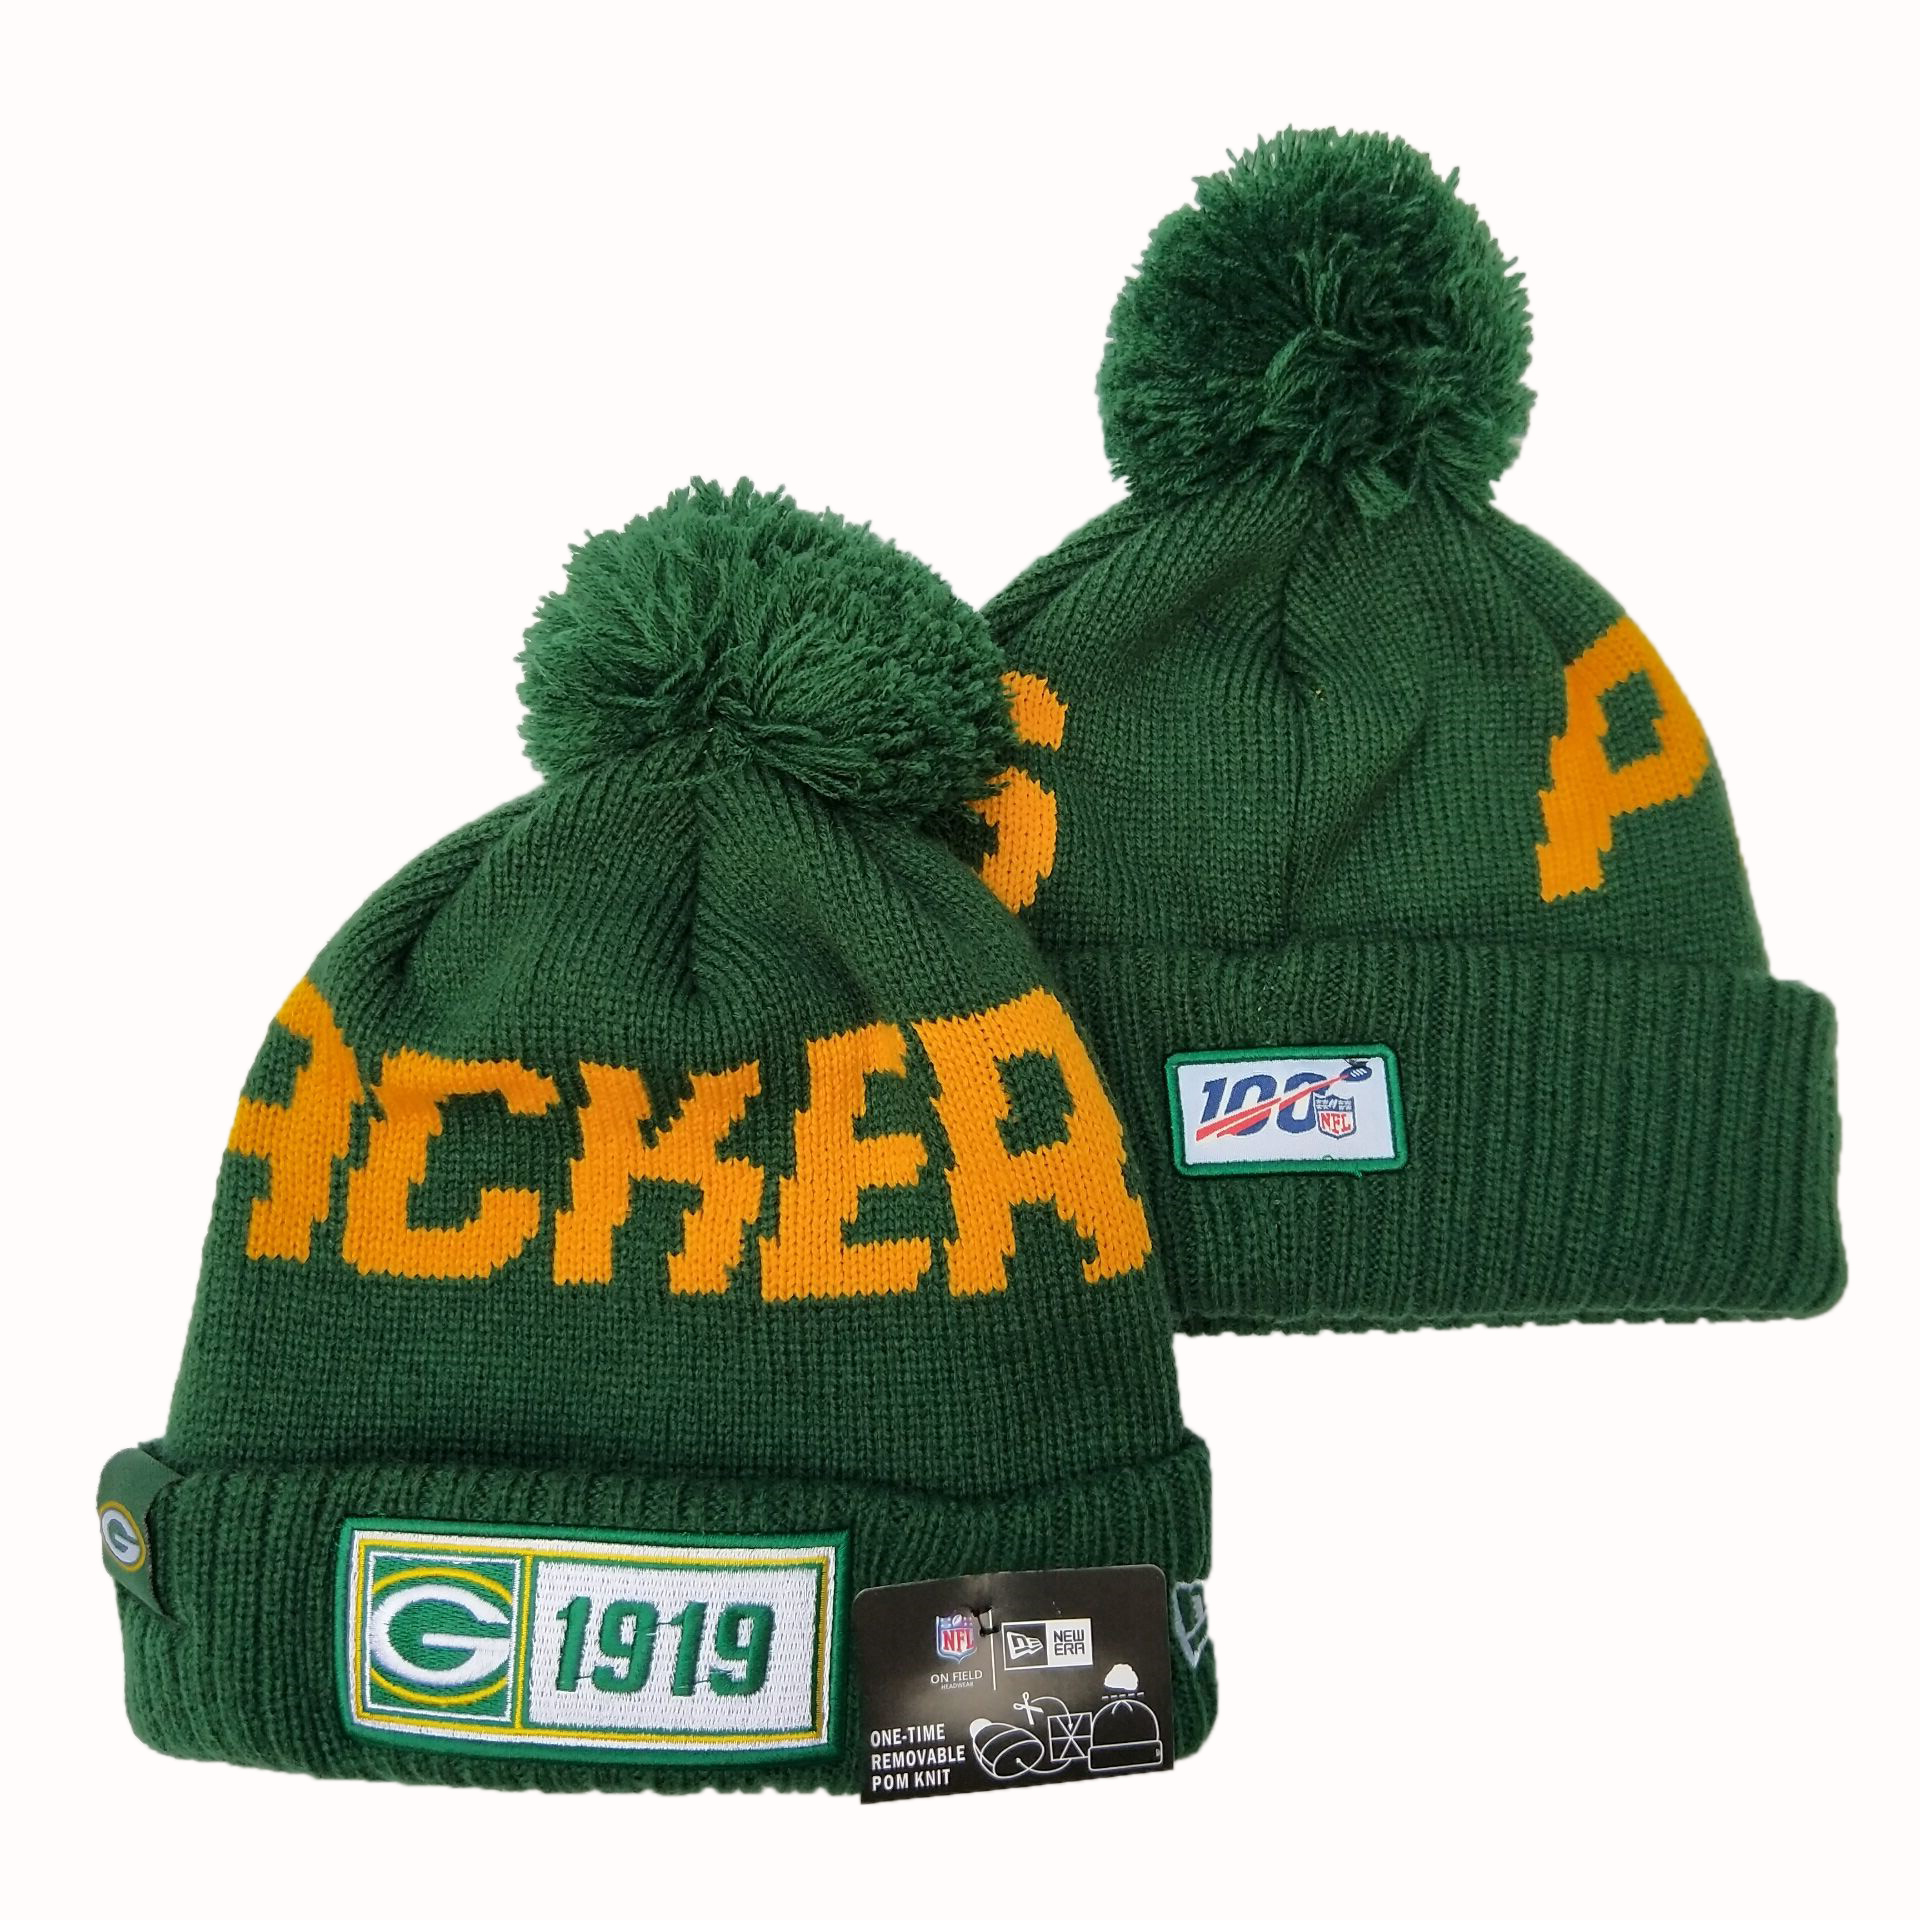 Packers Team Logo Green 100th Season Pom Knit Hat YD